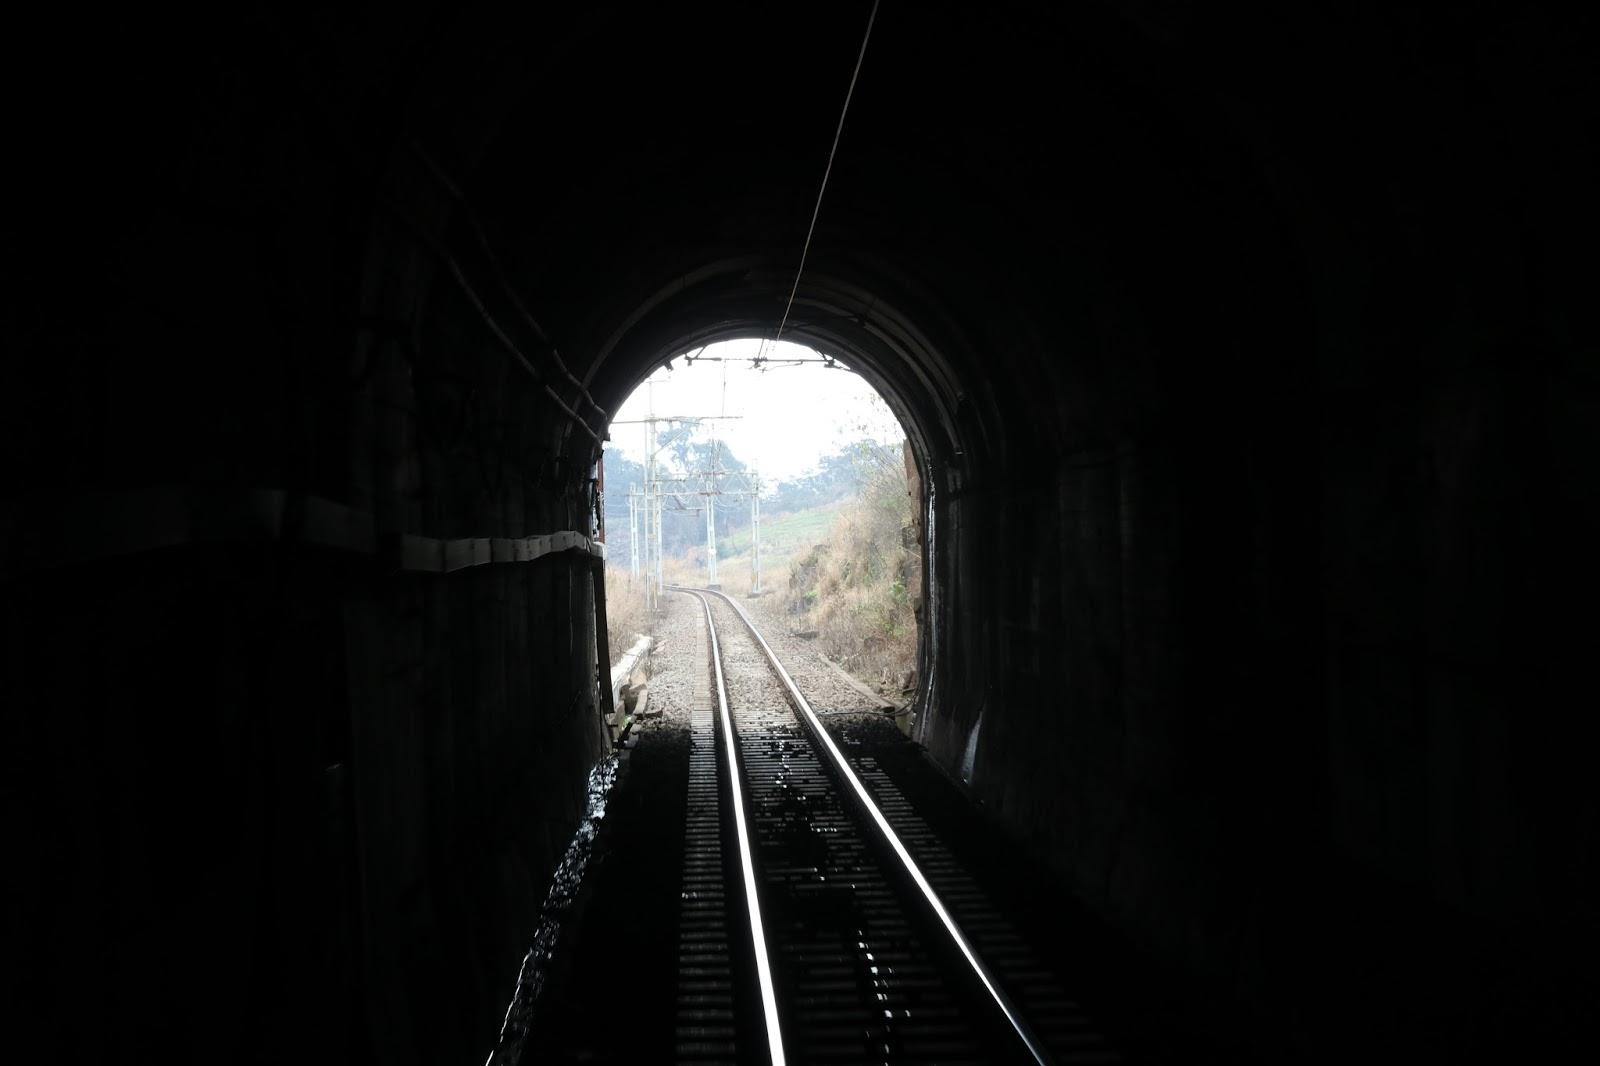 tunnel and train tracks